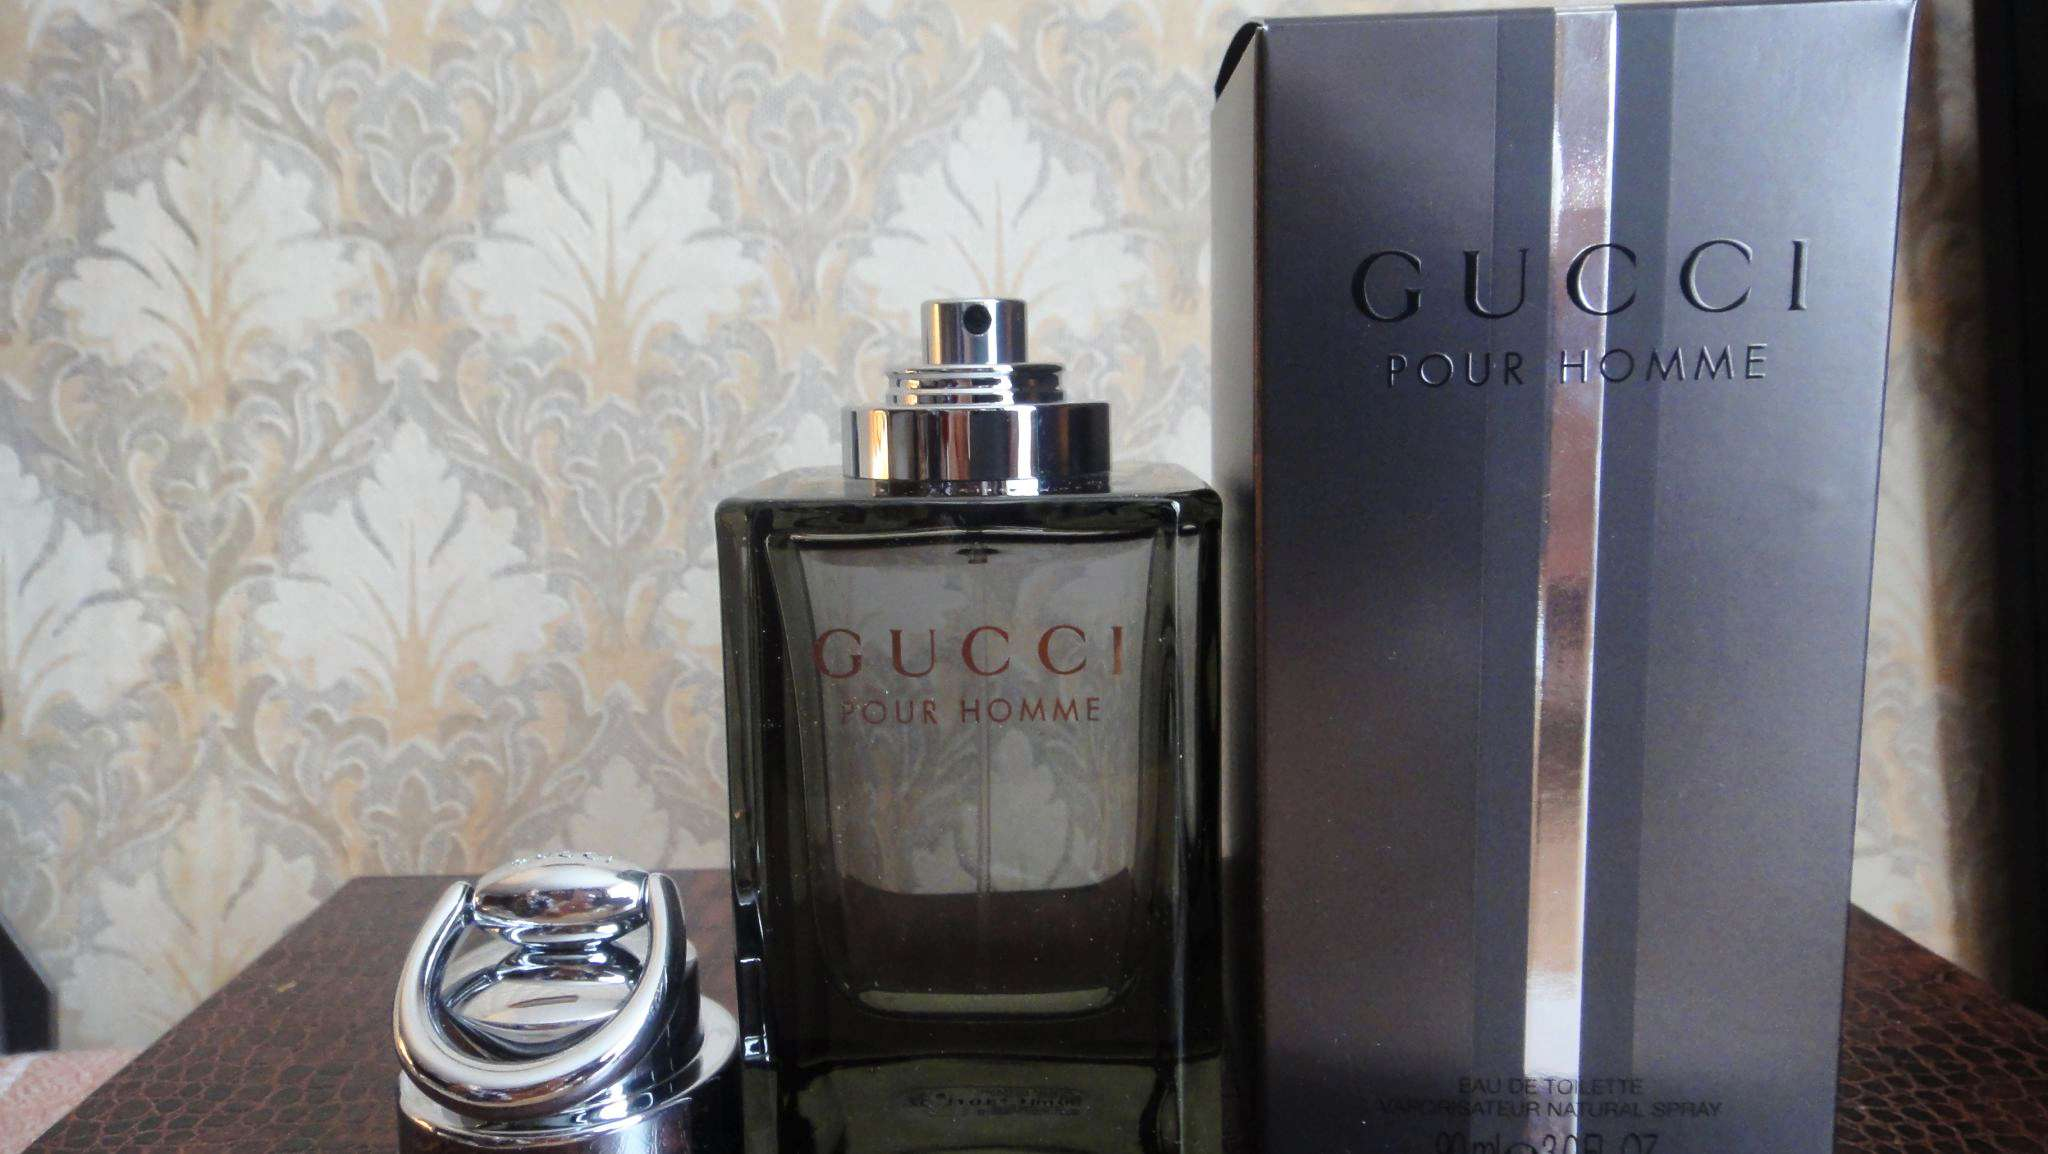 4c7499cc9c37 mugskaya tualetnaya voda gucci gucci by gucci pour homme 90 ml 1486911566 1.JPG